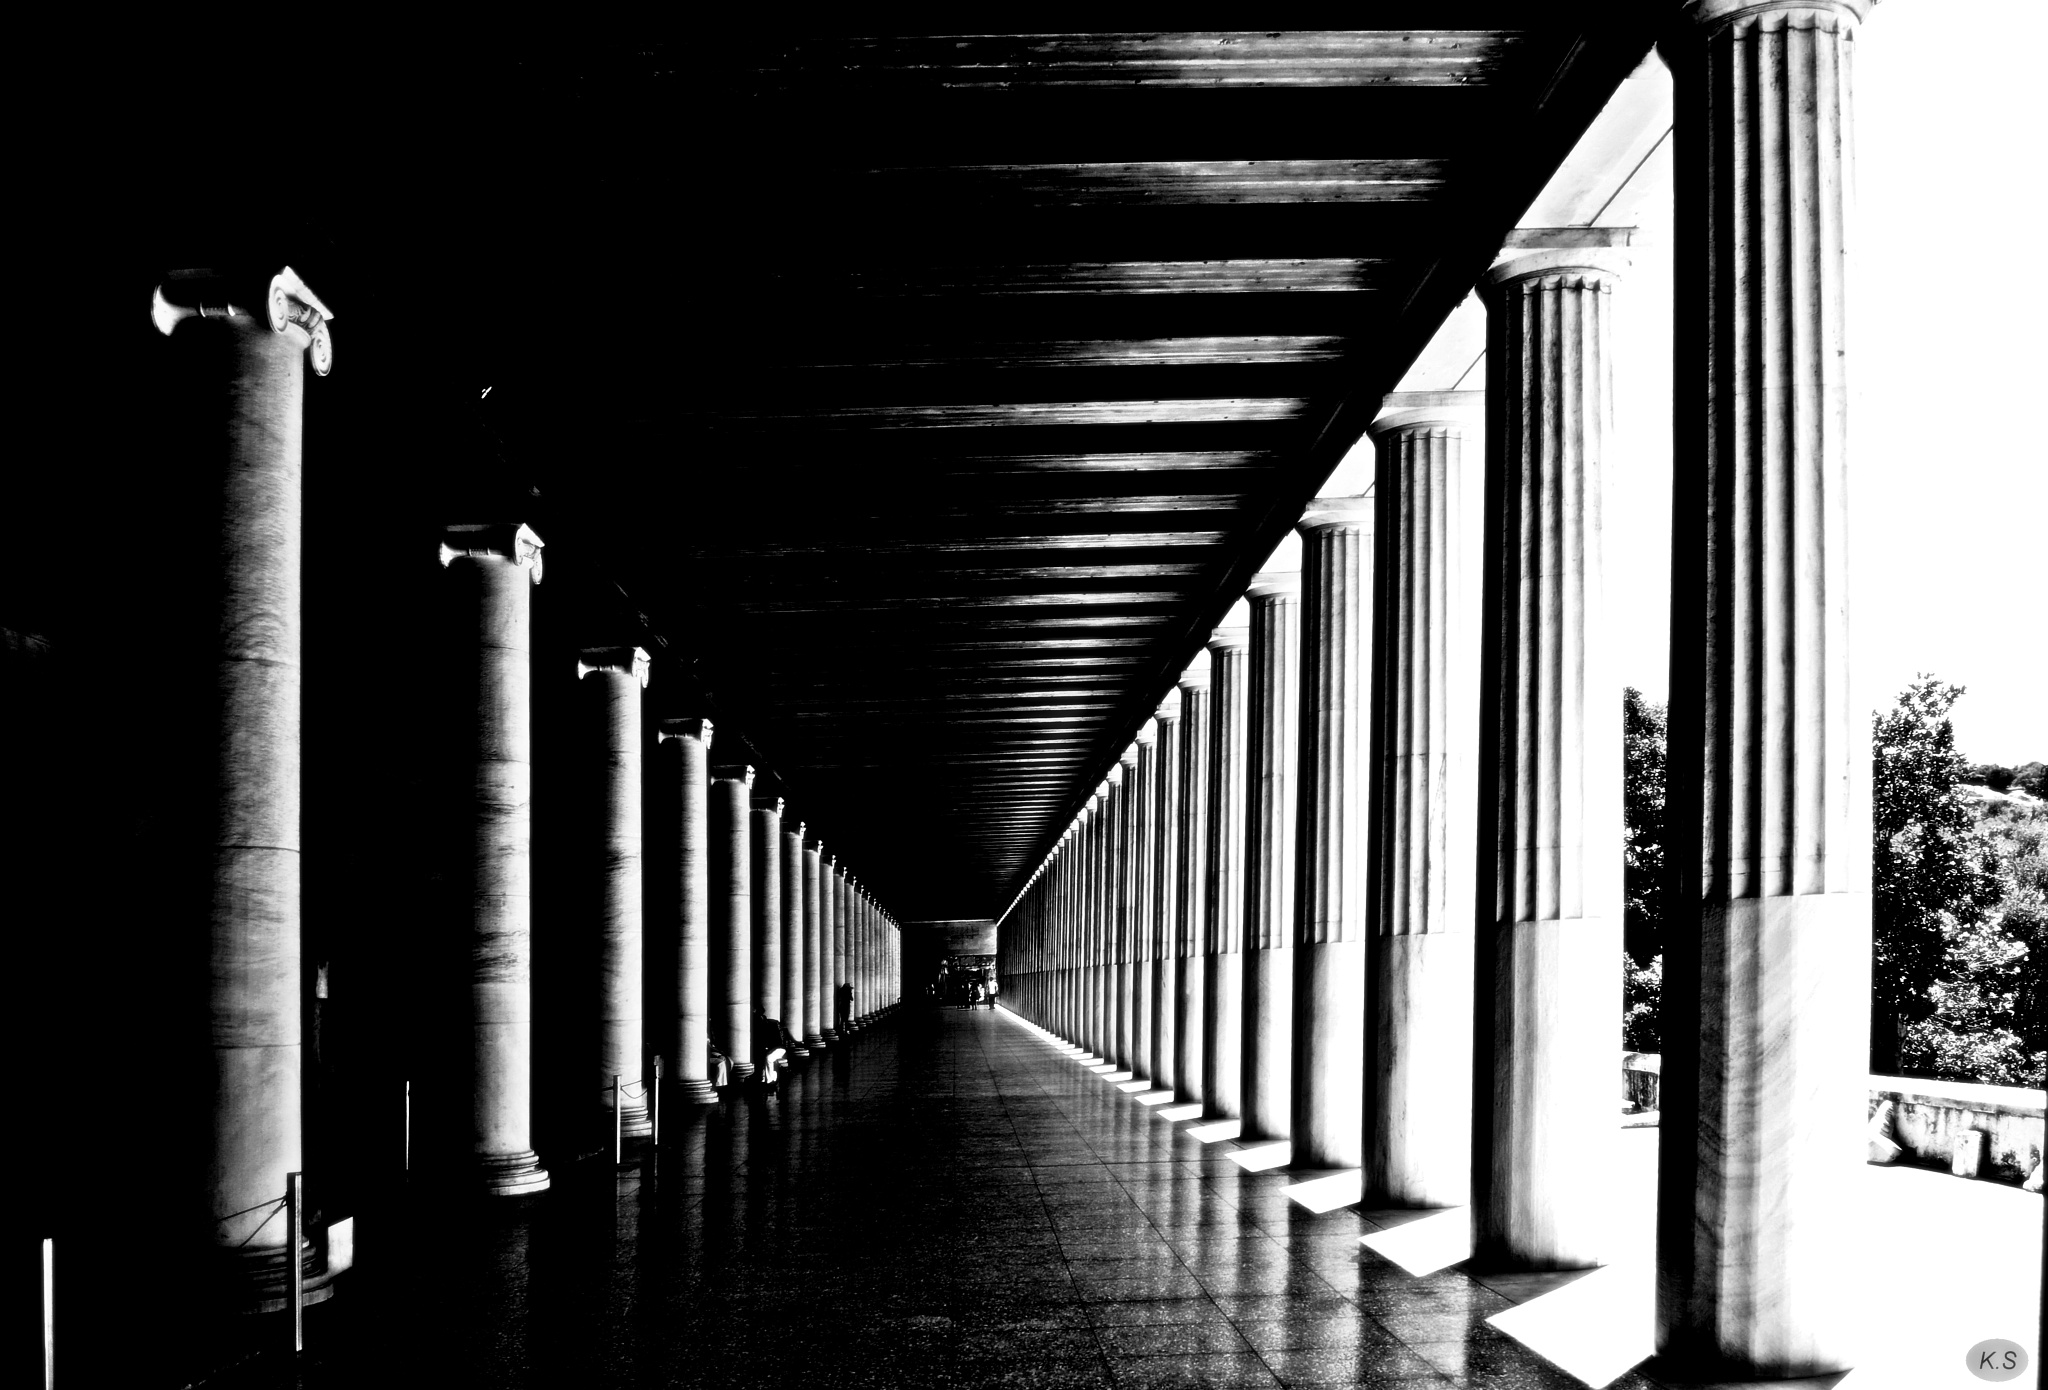 stoa ( covered walkway) of Attalos at Ancient Agora  by Katherine.Soulis